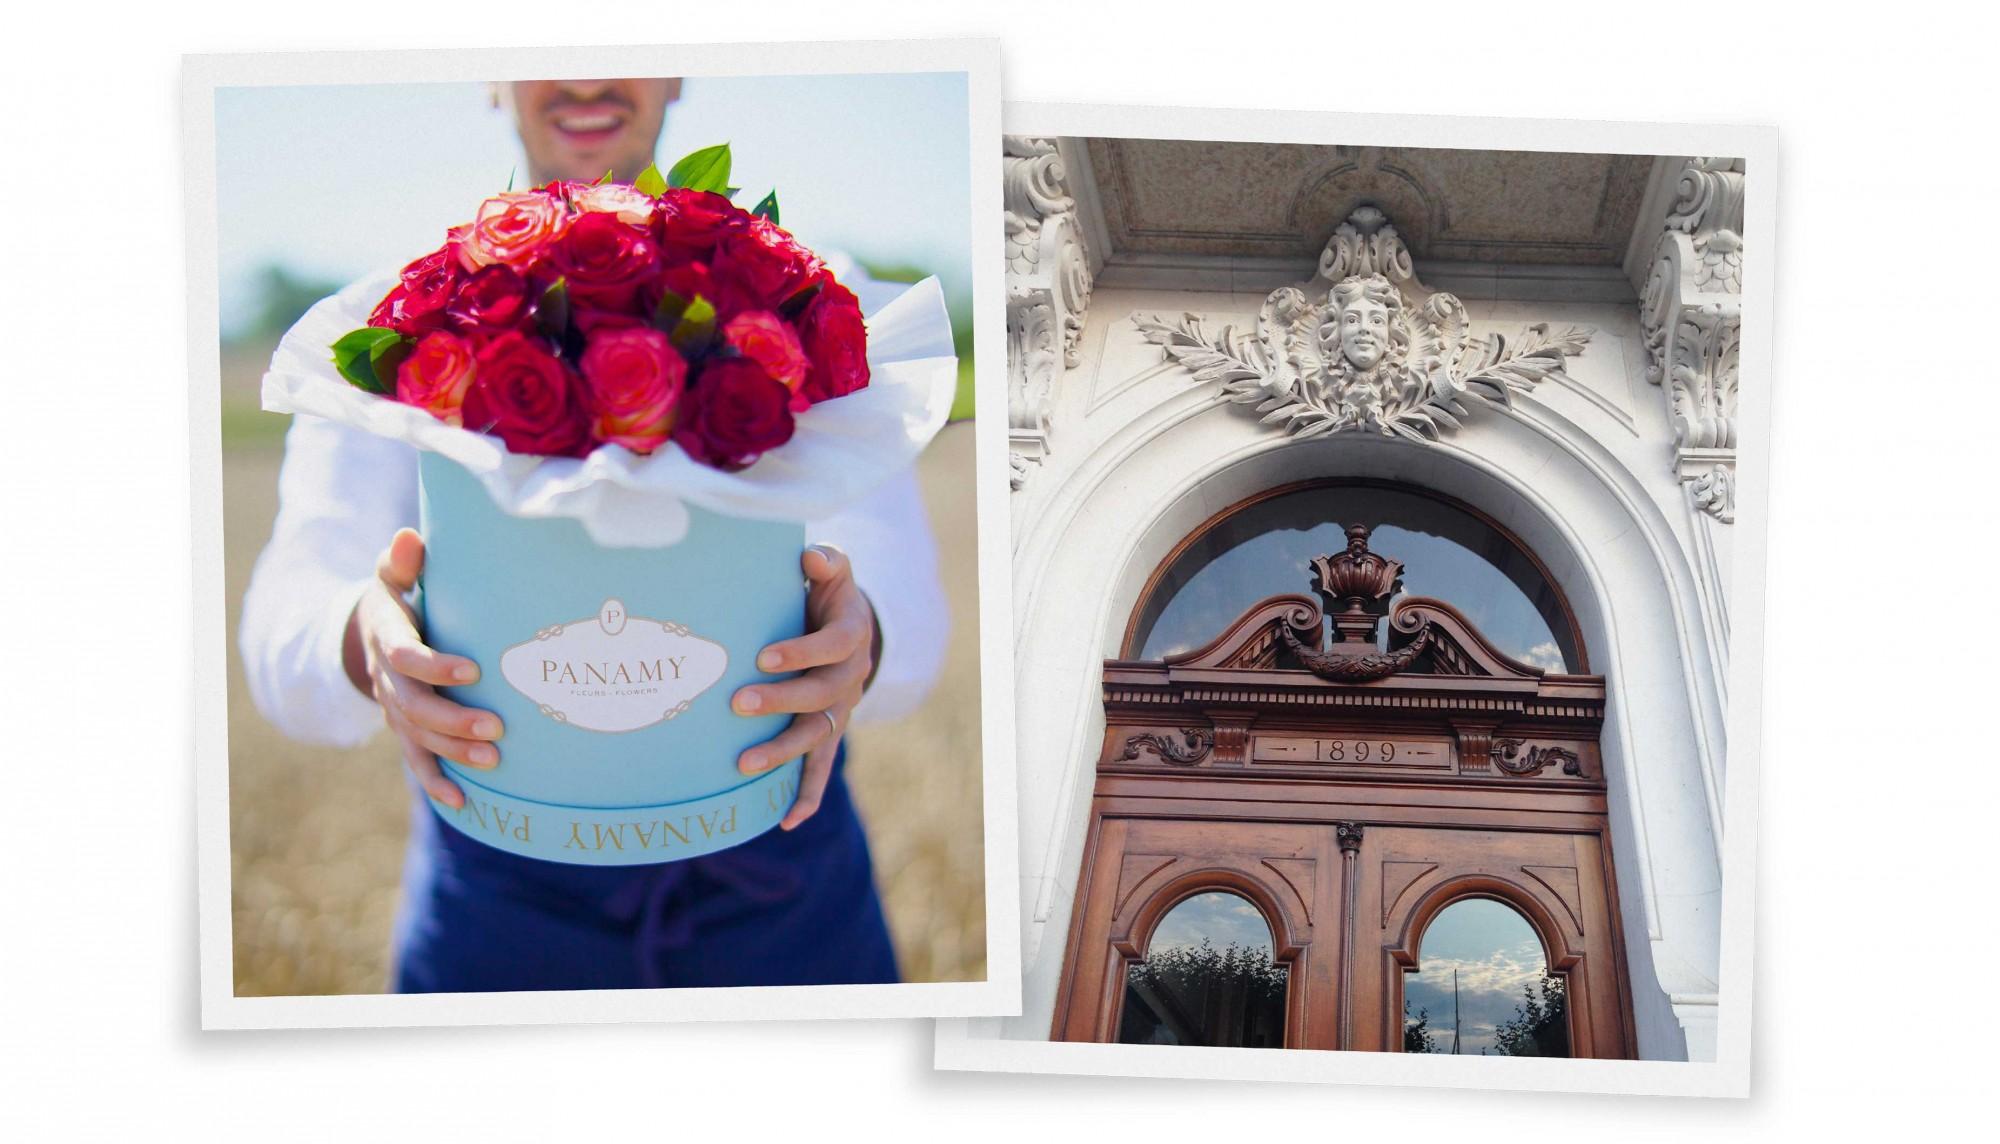 Personal Delivery - PANAMY Flower Delivery Switzerland Zürich, Basel, Luzern, Zug, Bern